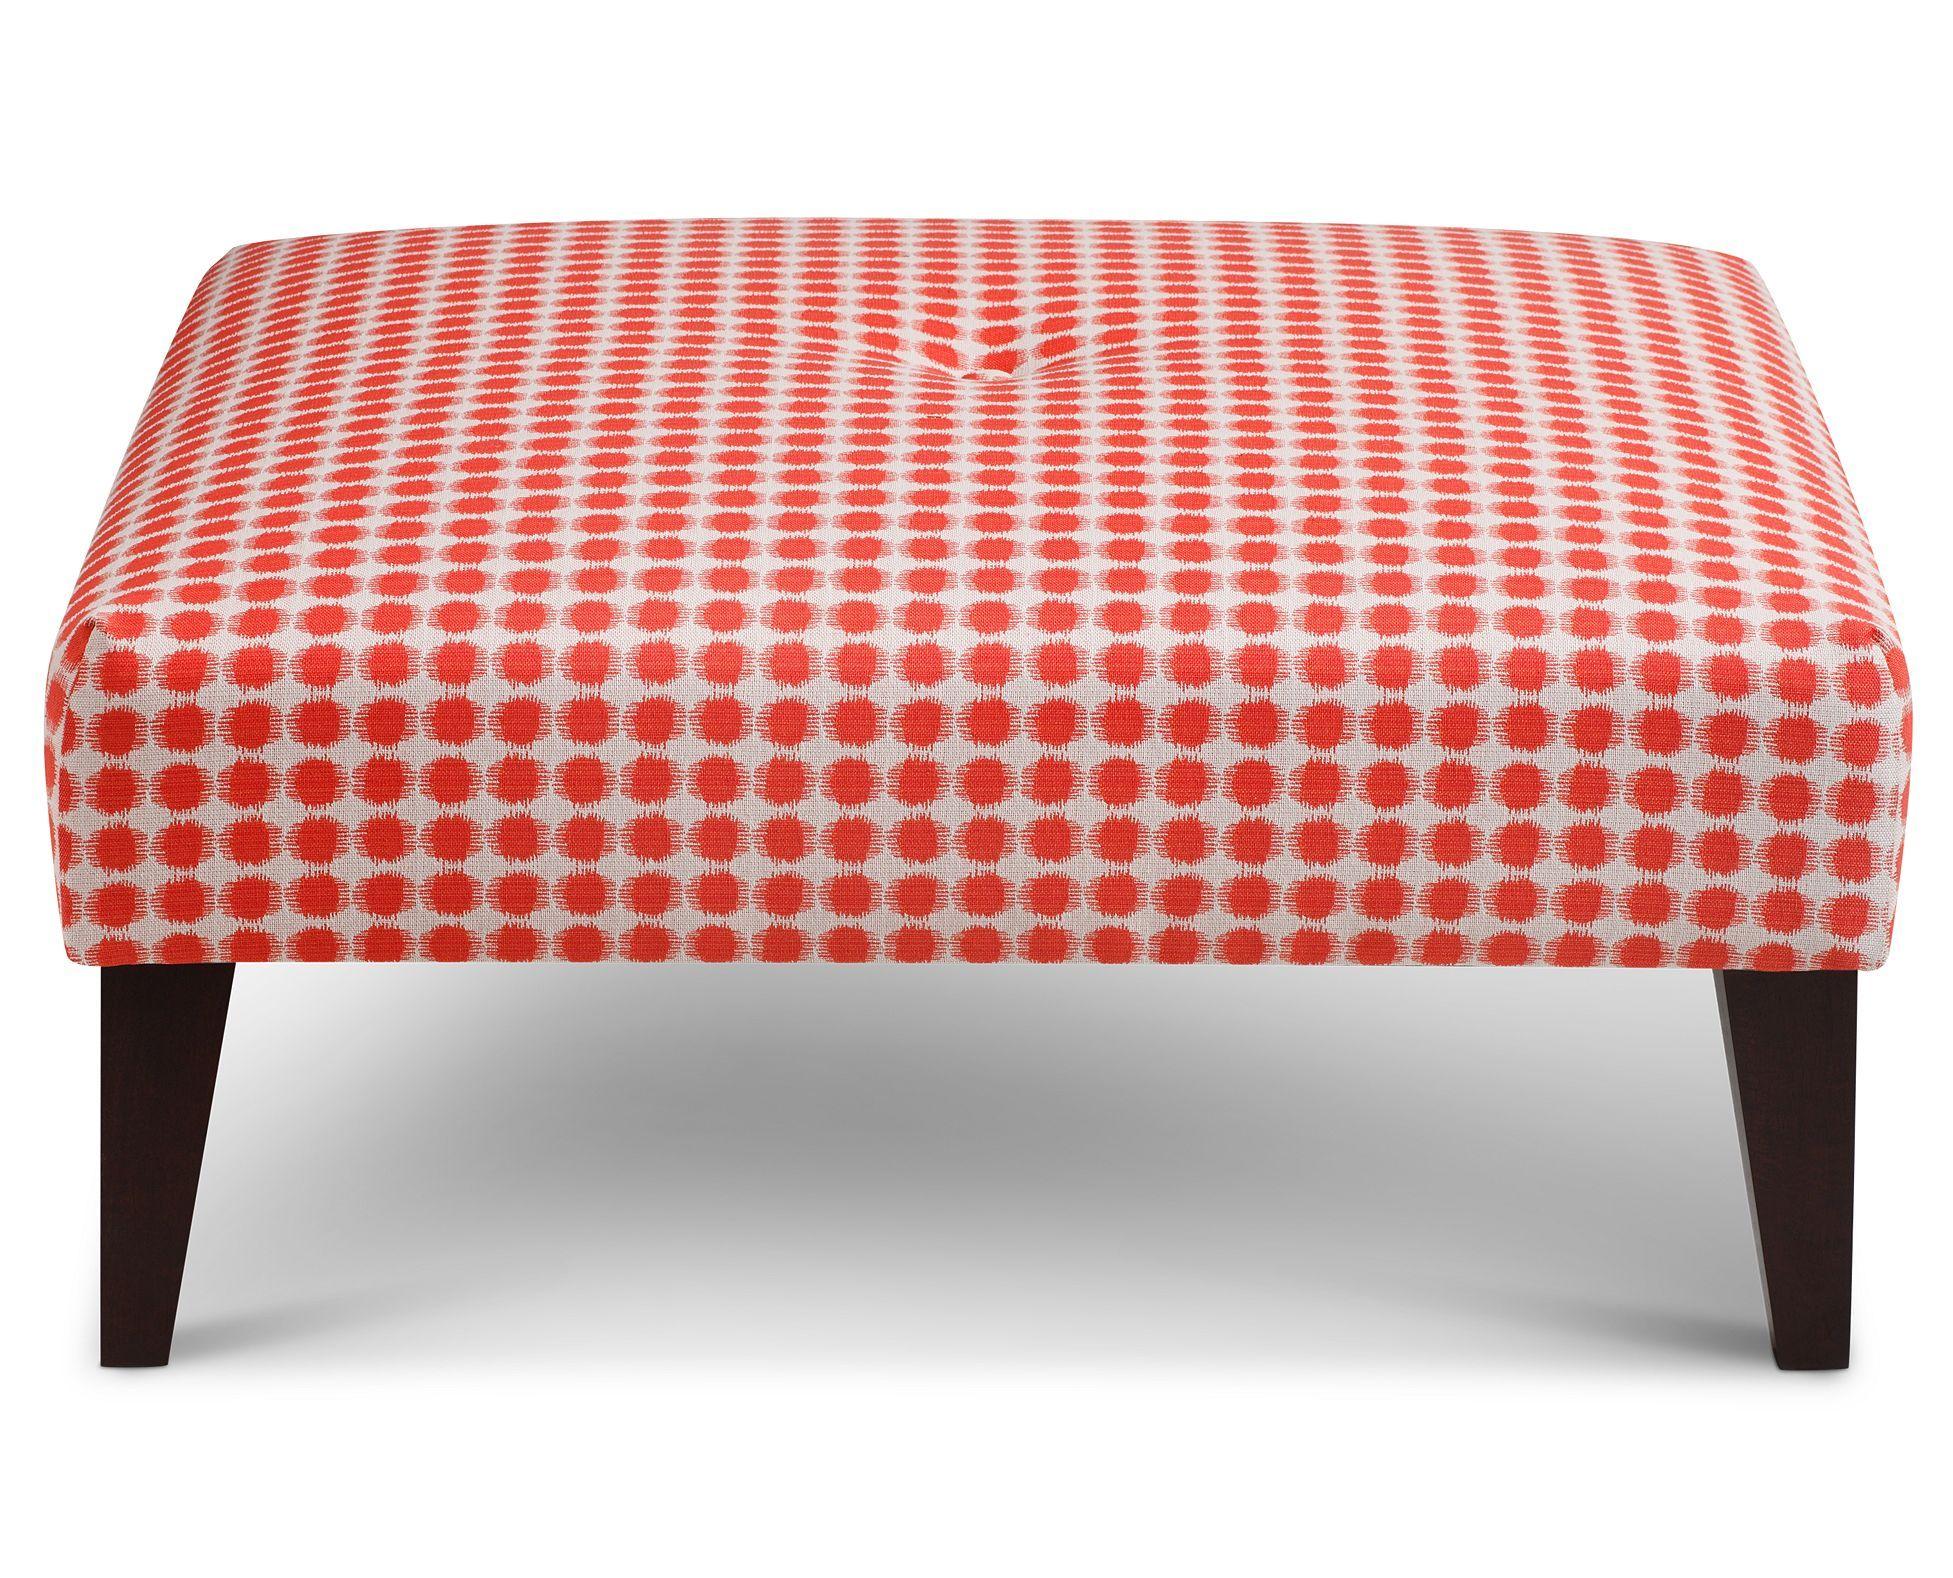 Admirable Jillian Accent Ottoman Living Room Ottoman Furniture Creativecarmelina Interior Chair Design Creativecarmelinacom